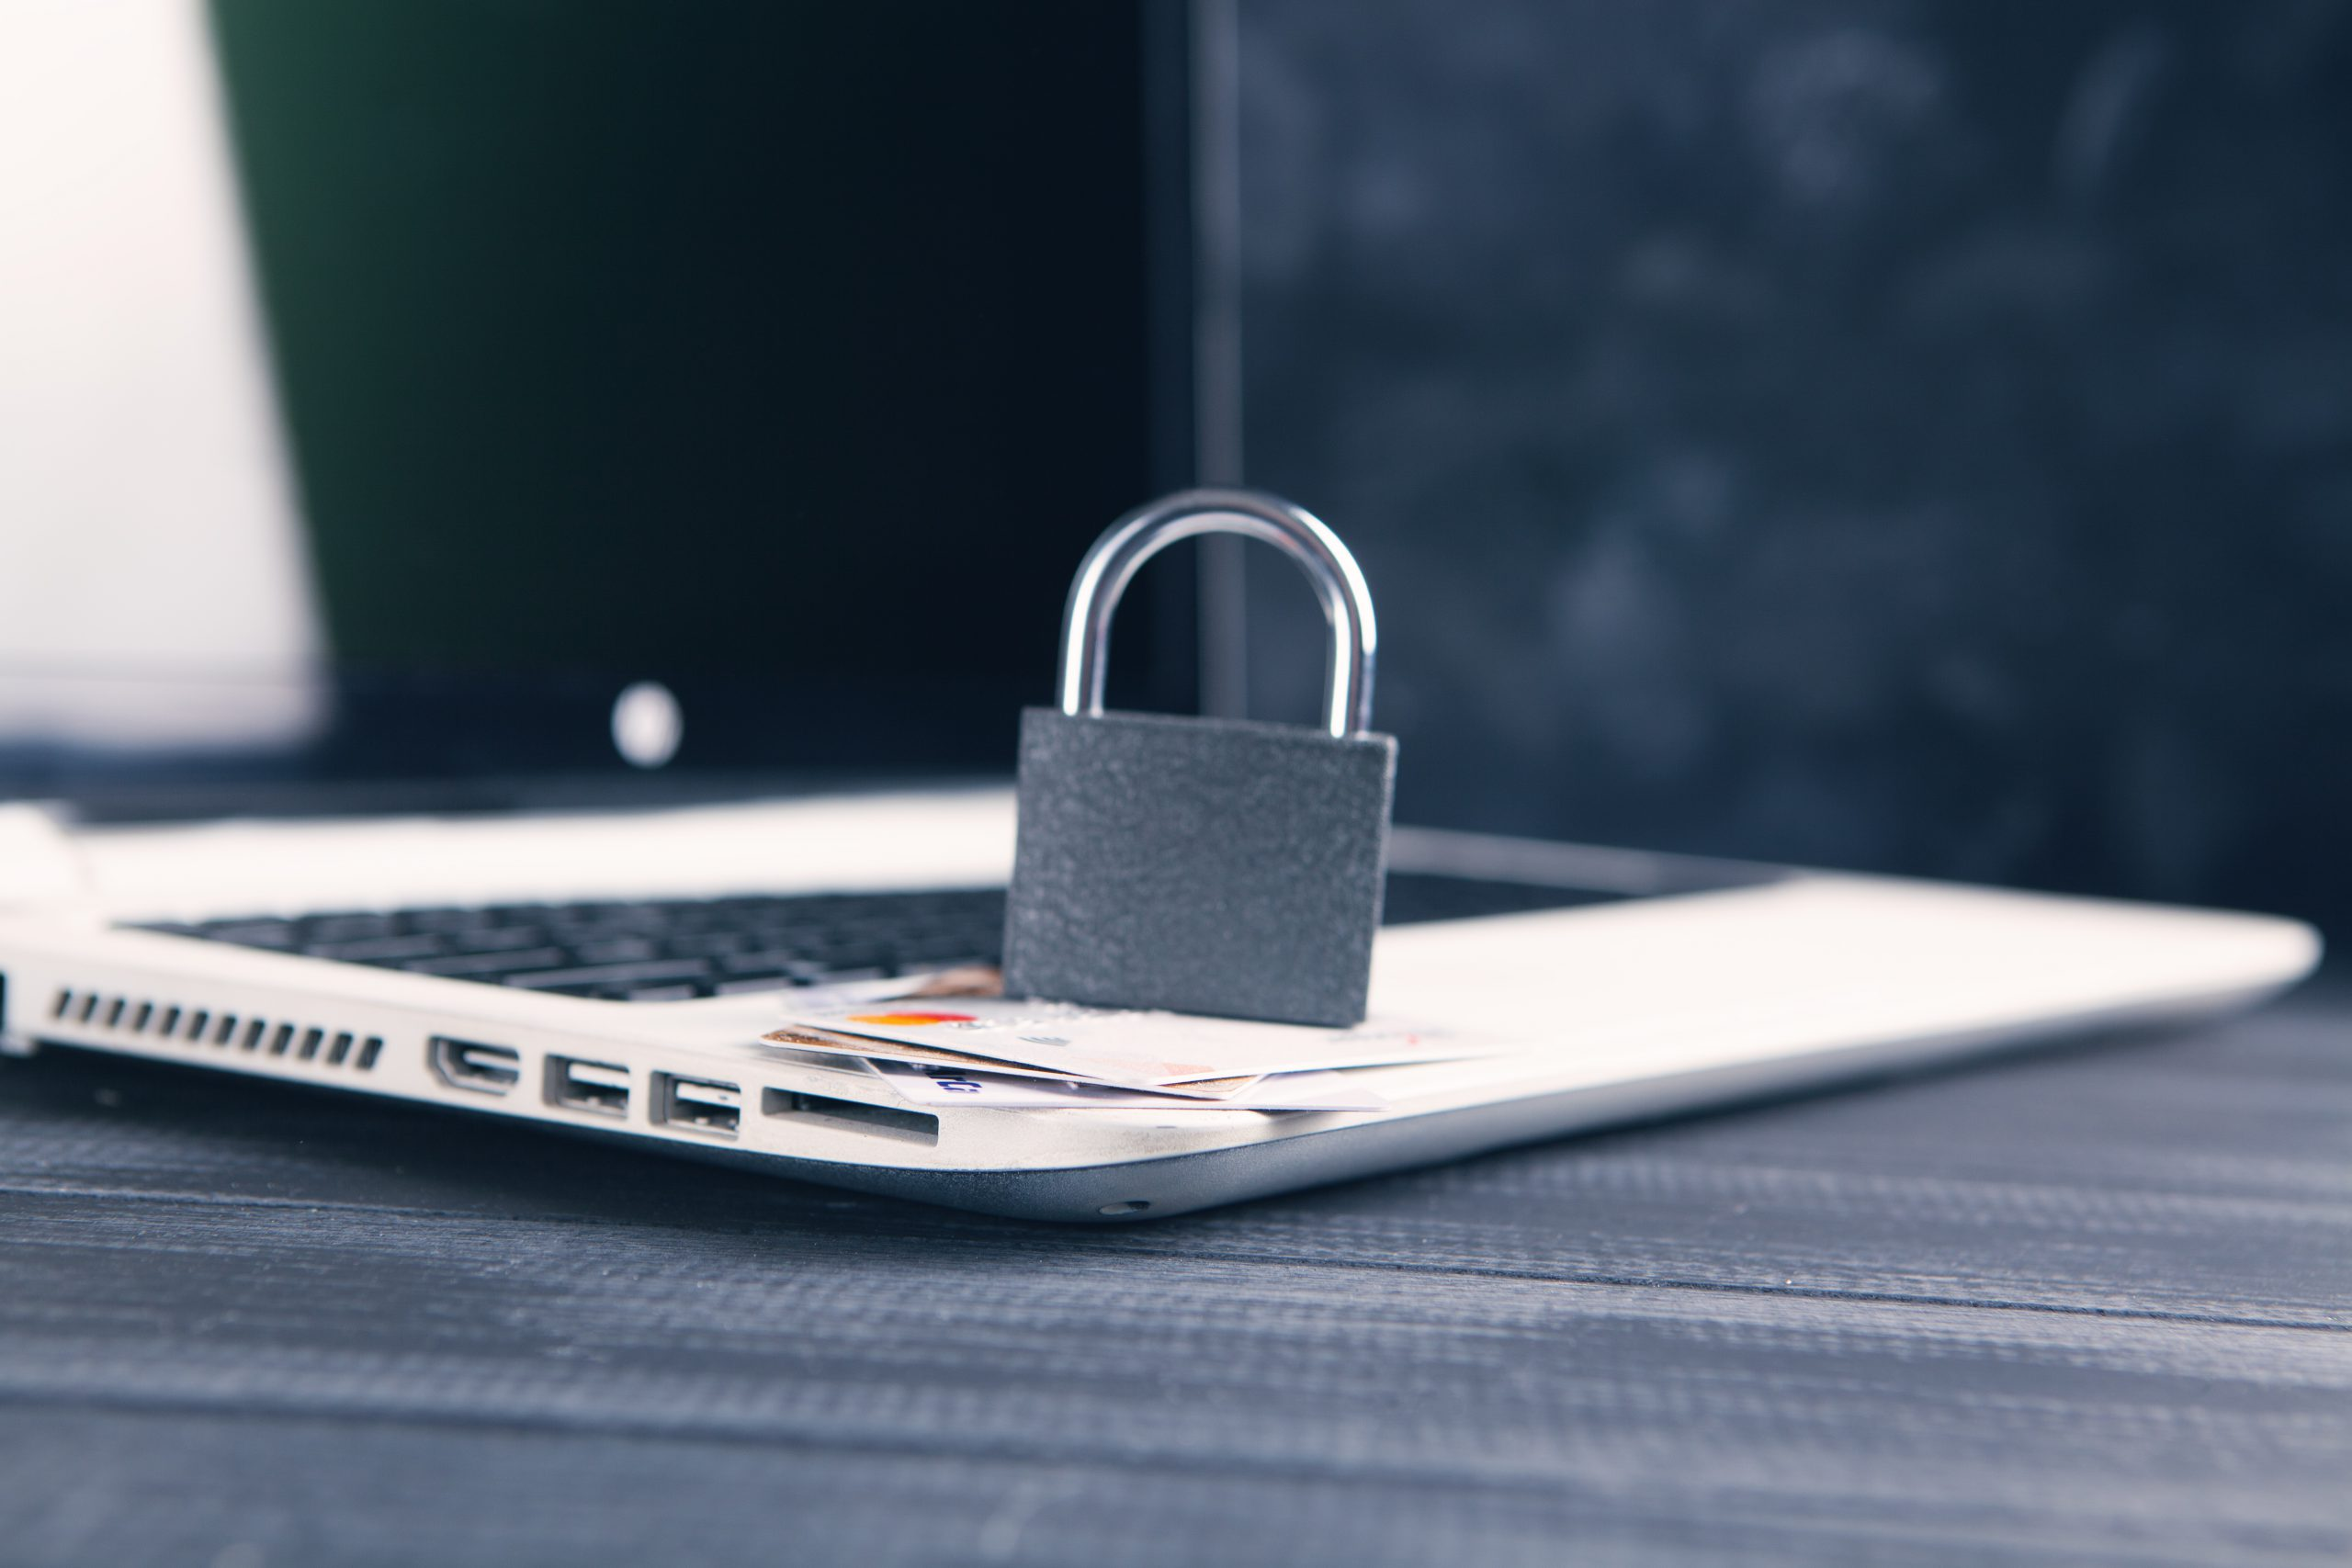 Device encryption proactive device management